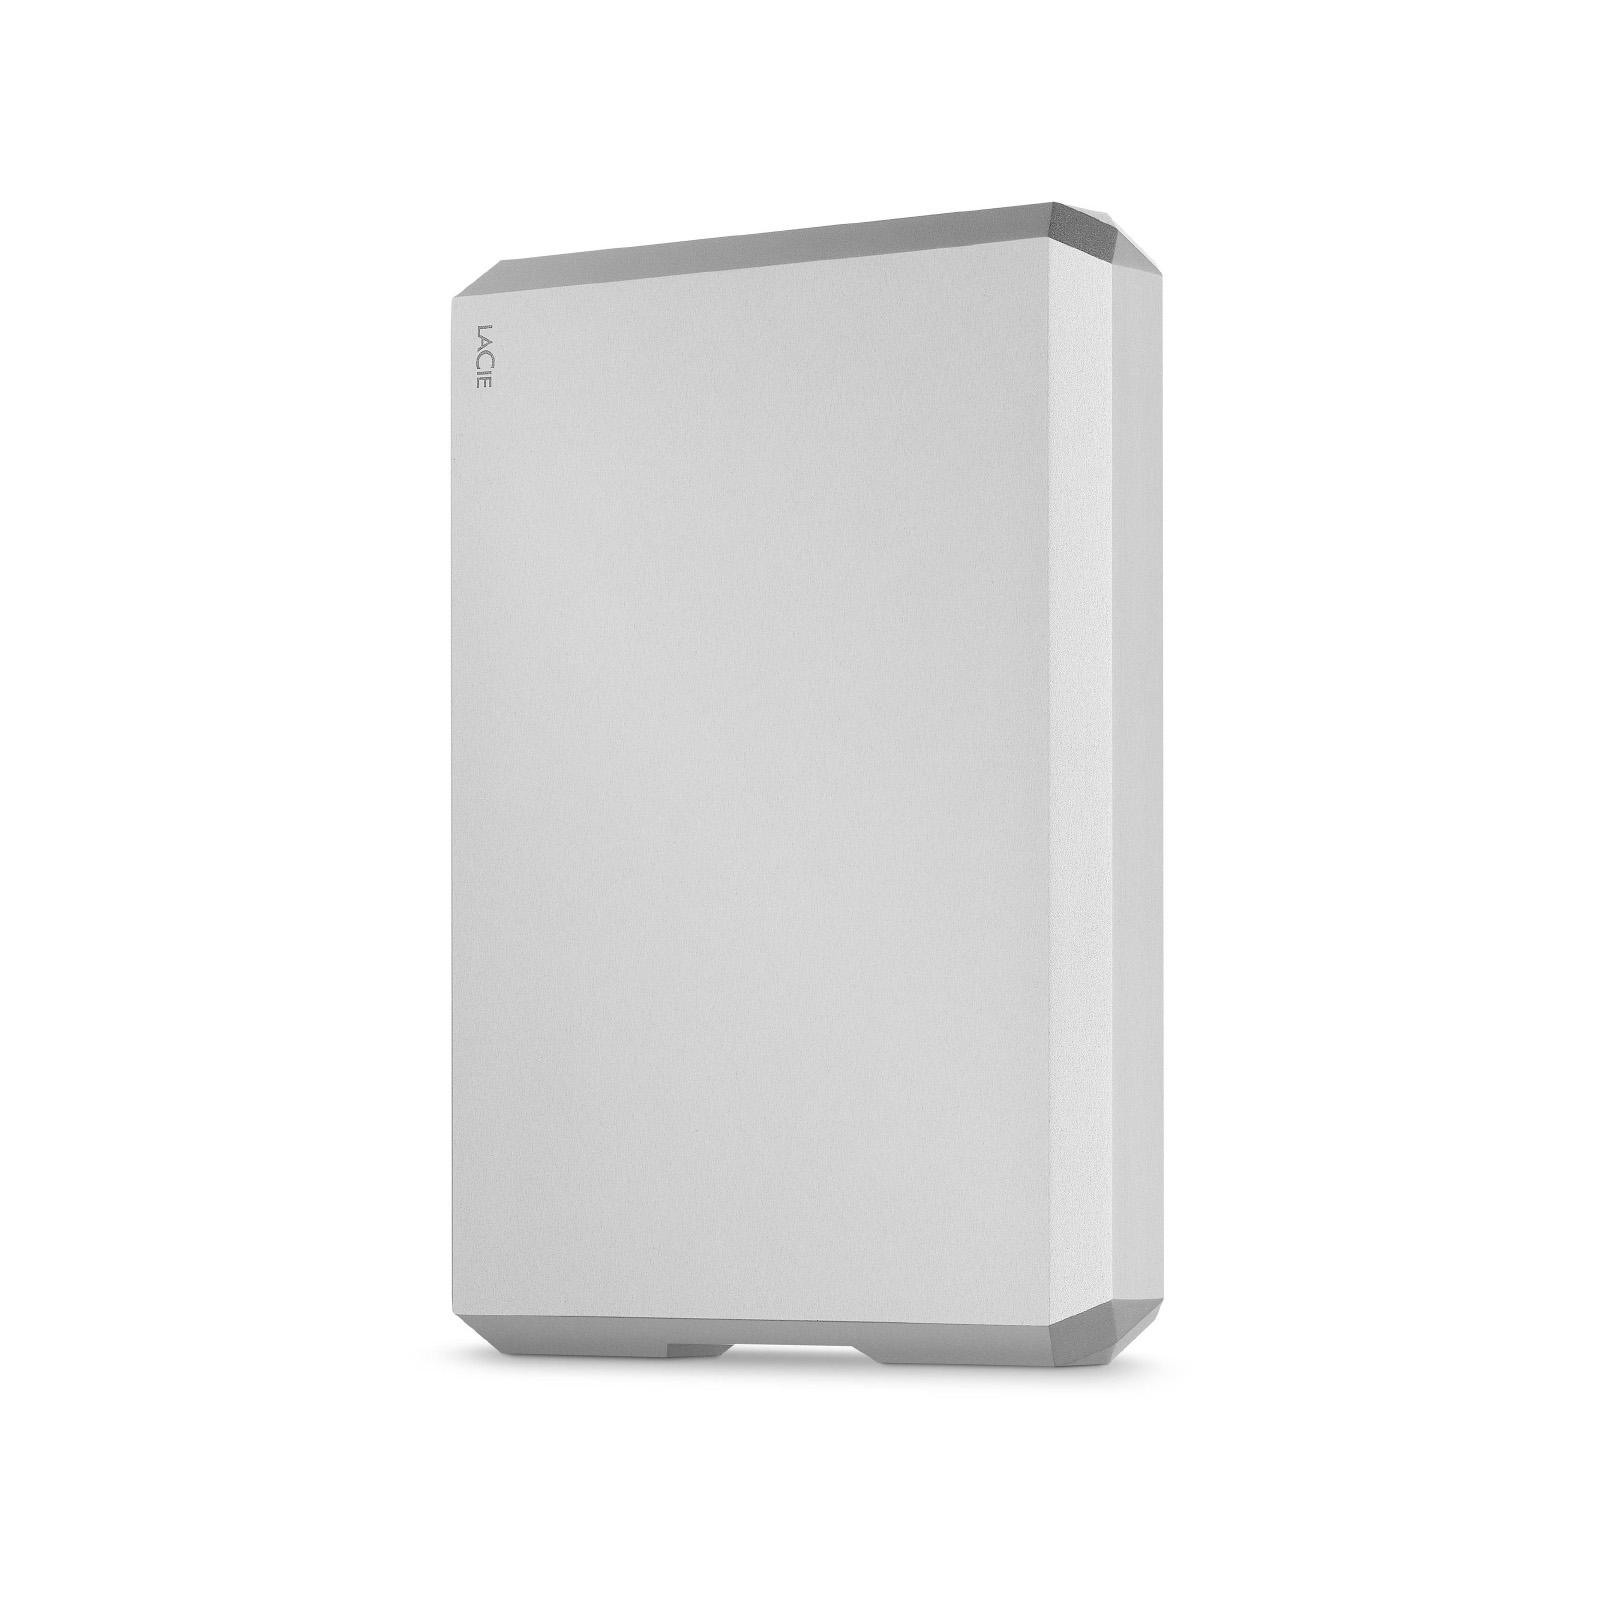 LACIELACIE 4TB 2.5 MOBILE ABLE USB 3.0 MOON SILVER